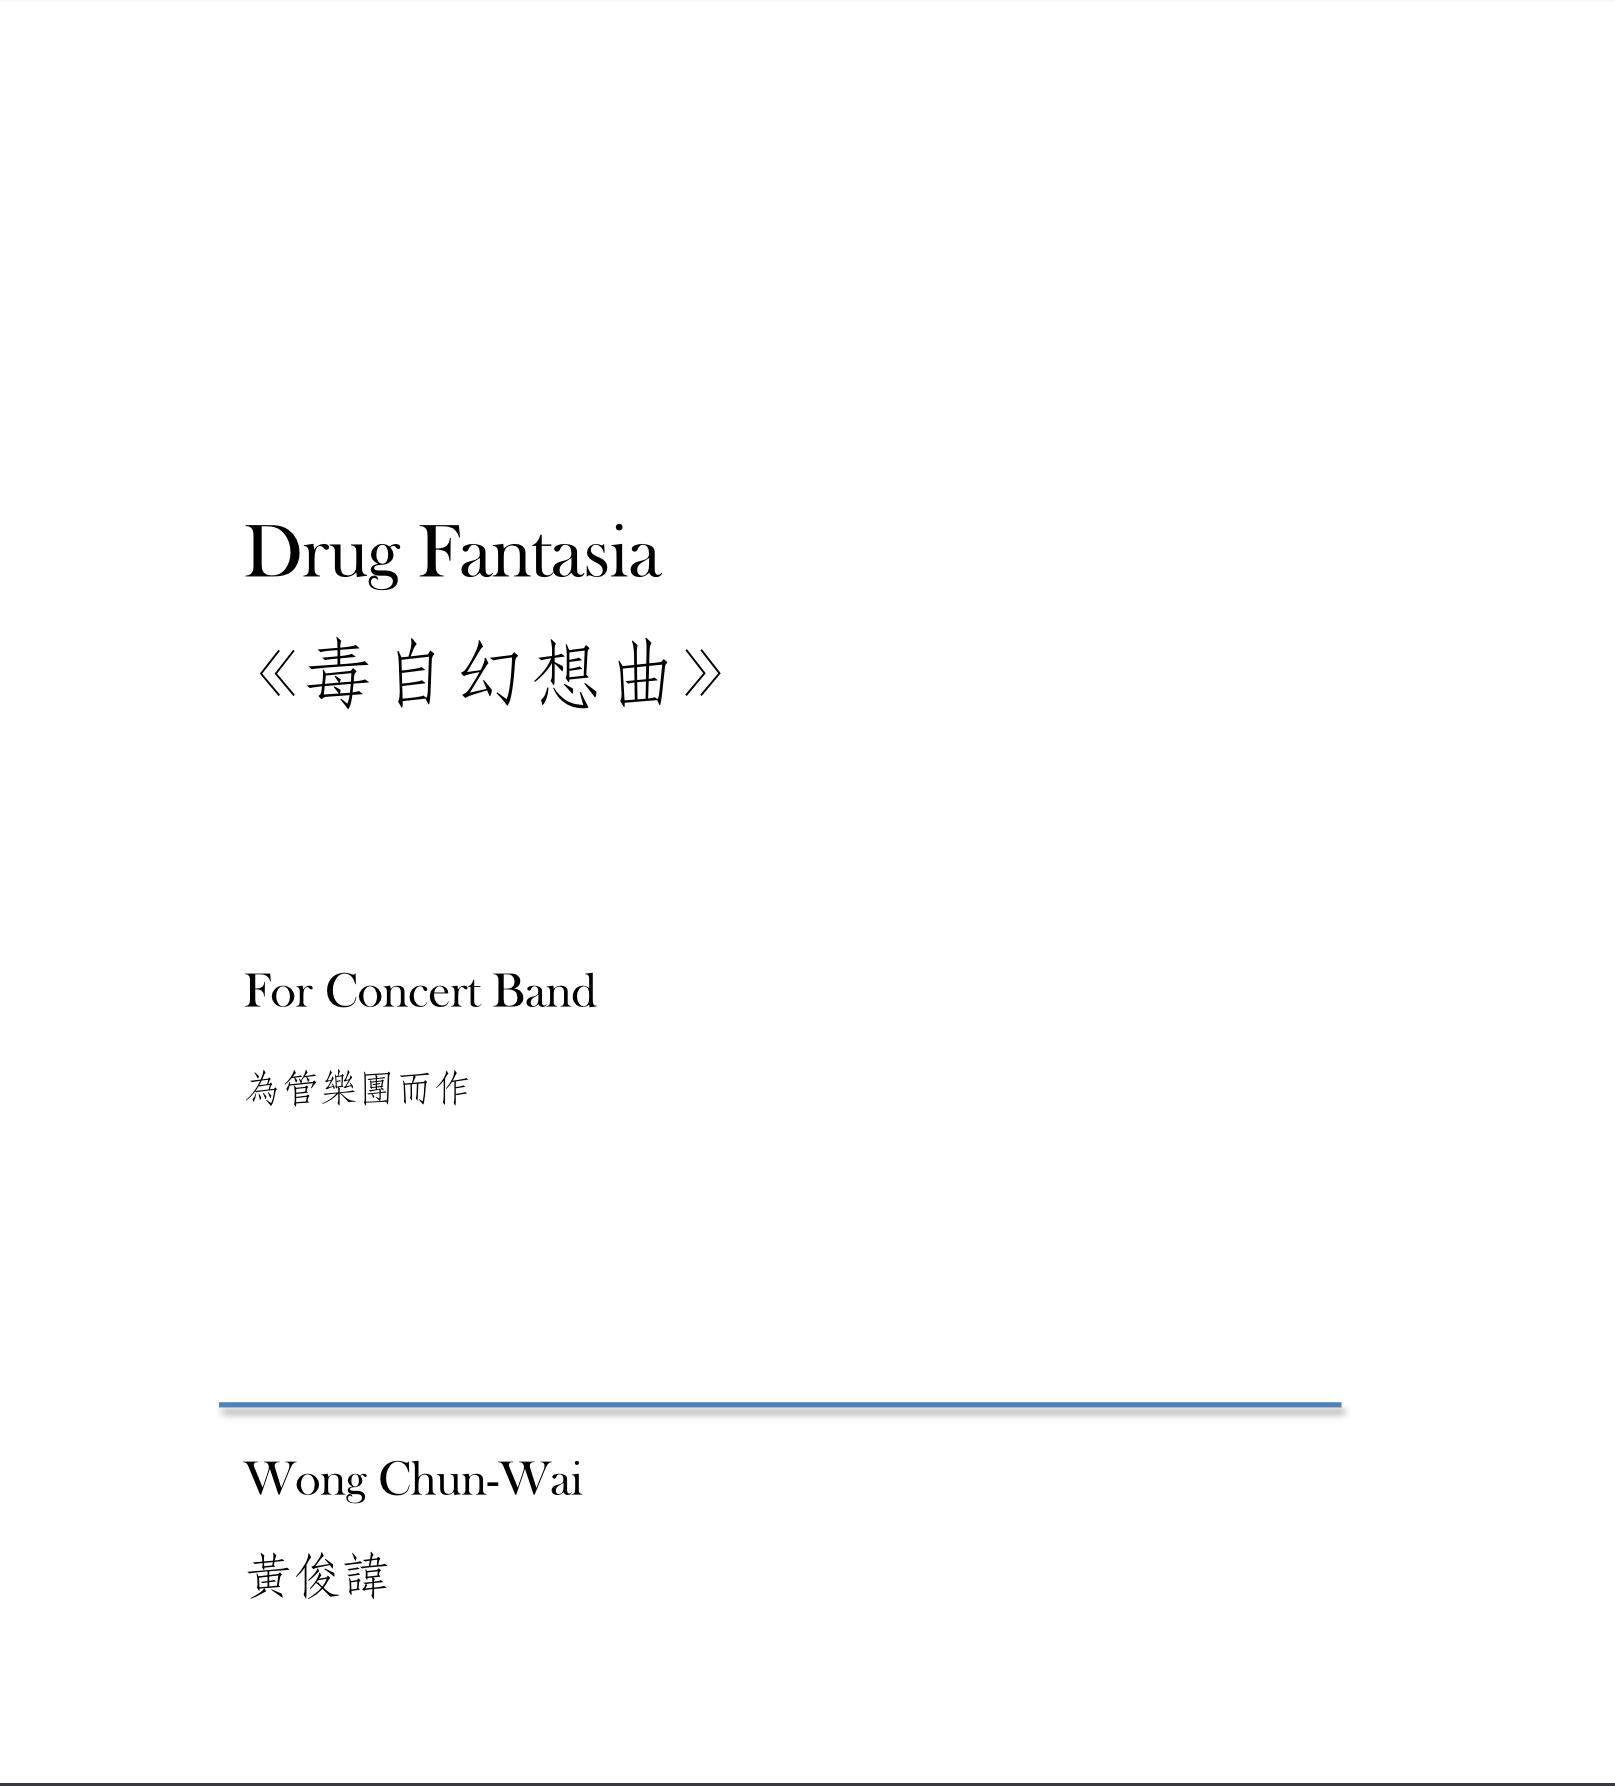 Drug Fantasia by Chun-Wai Wong